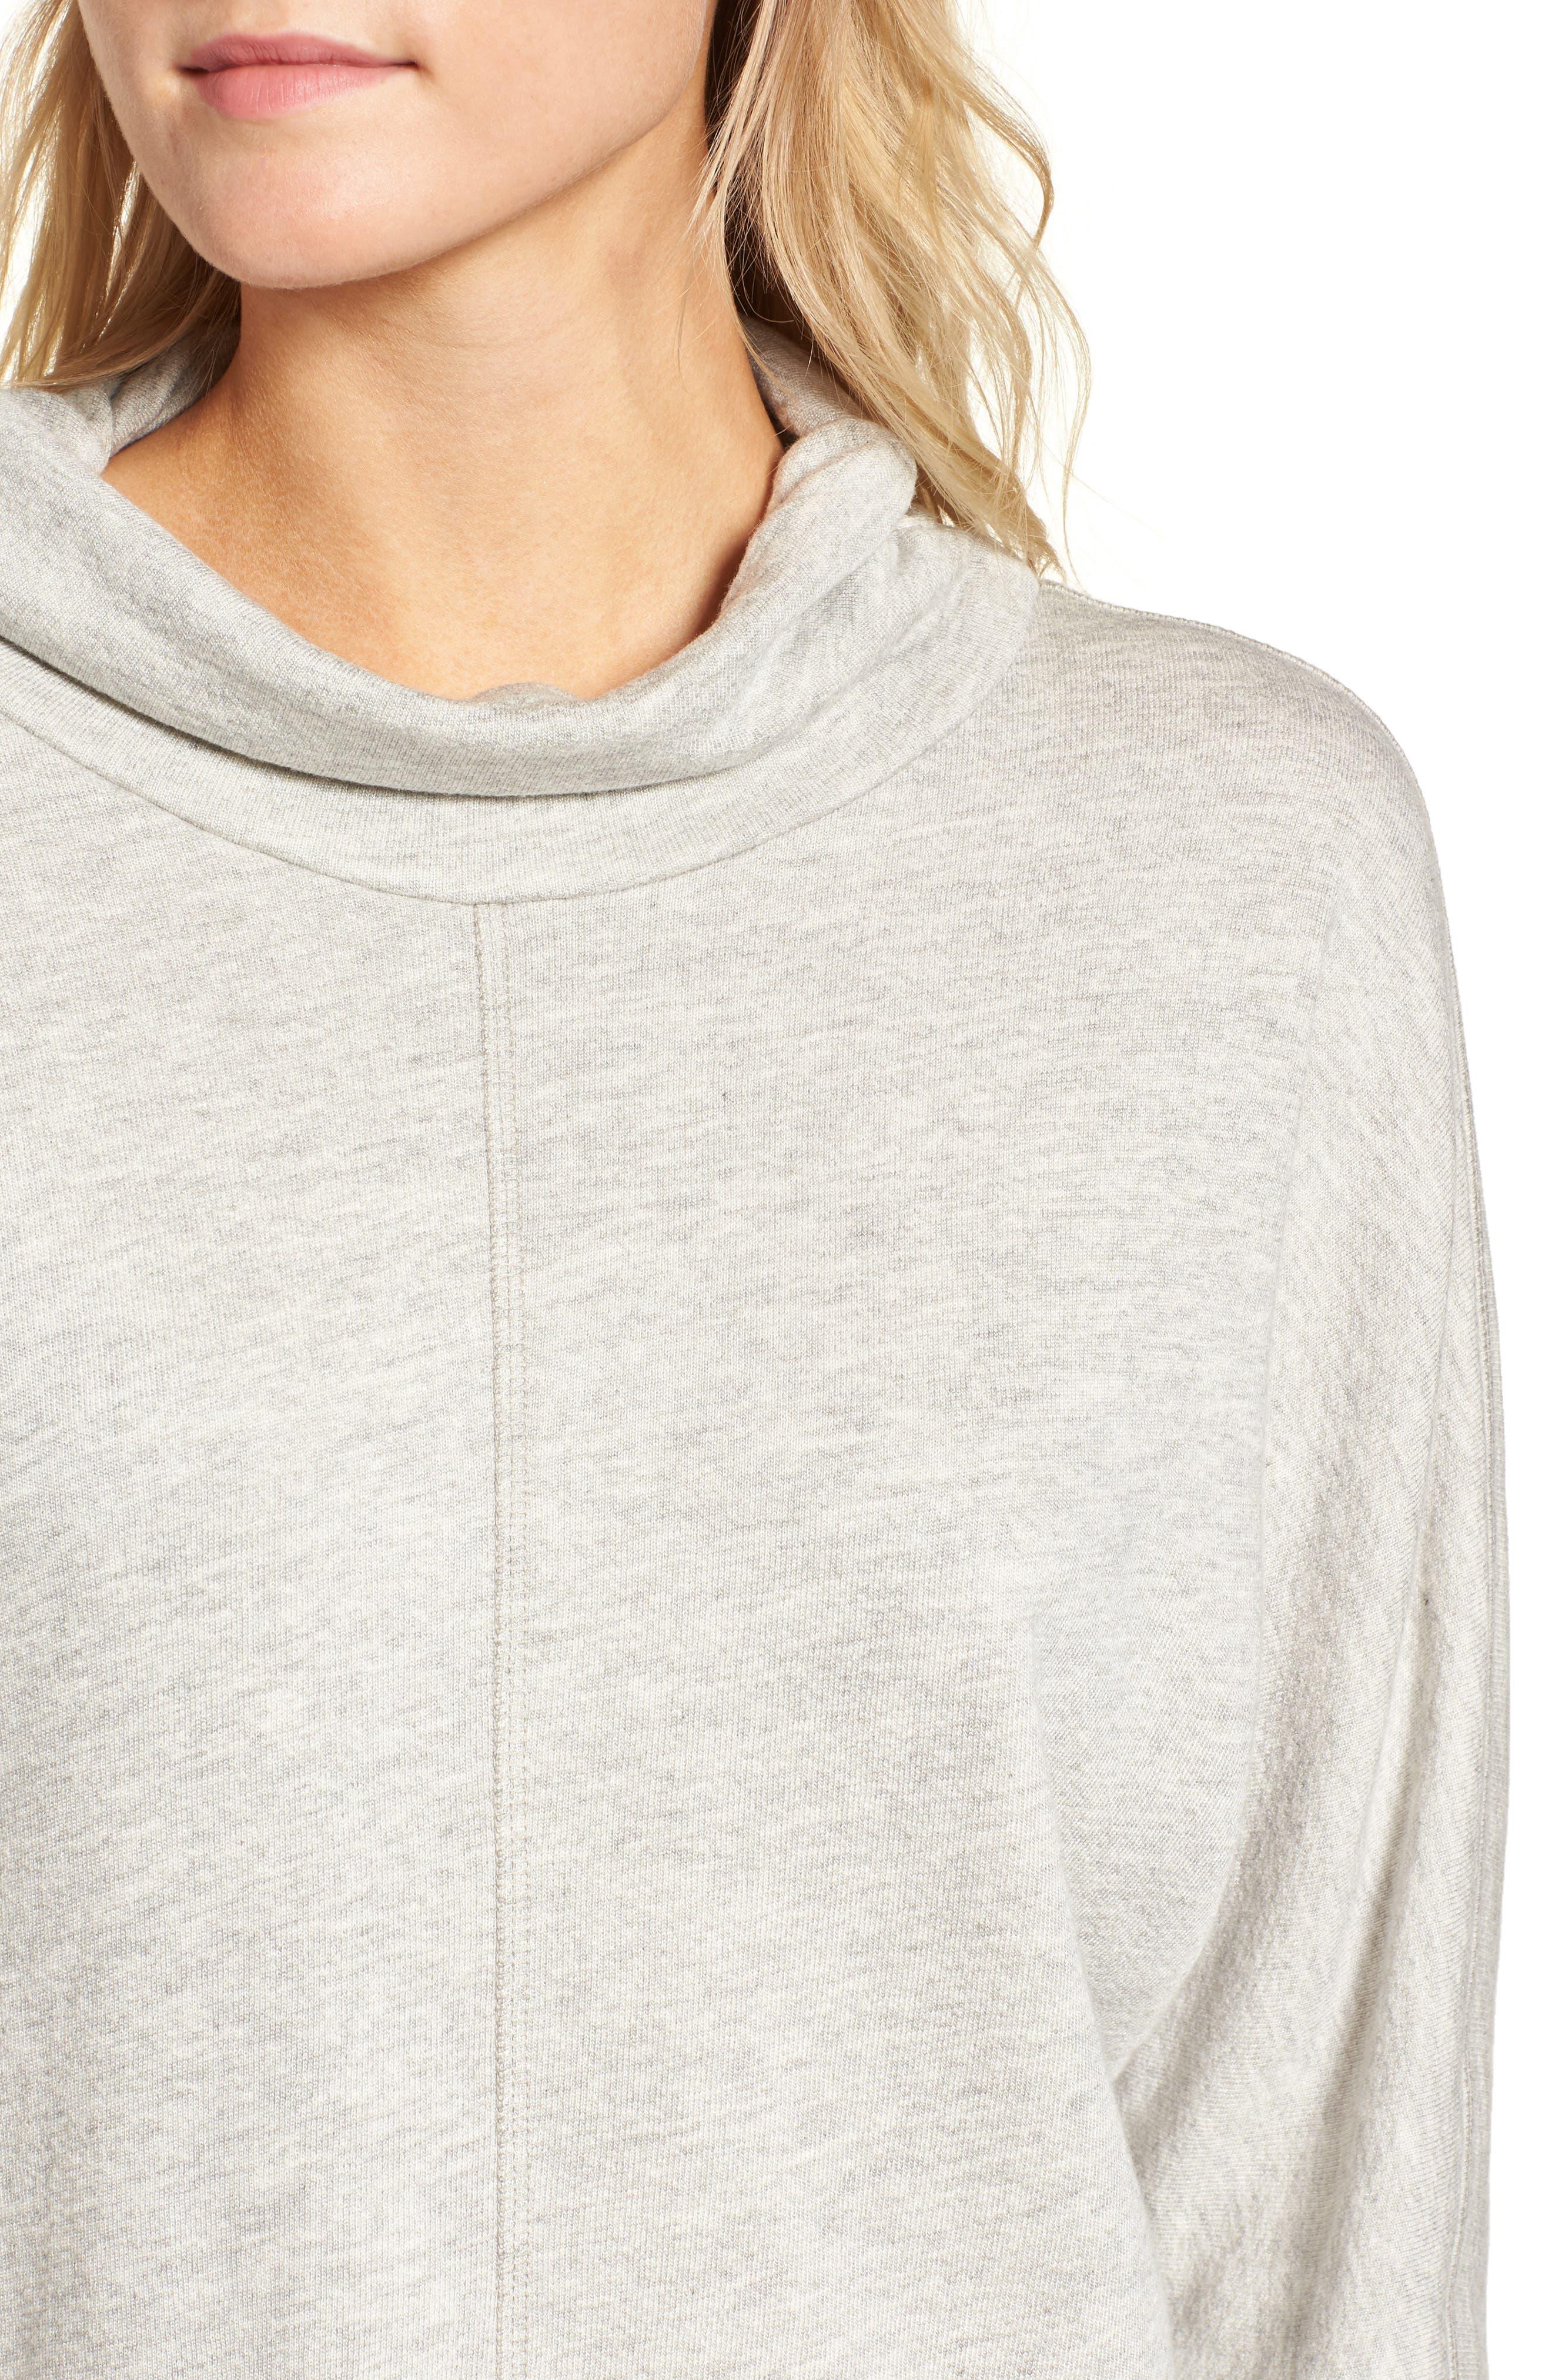 Helix Turtleneck Sweatshirt,                             Alternate thumbnail 4, color,                             Heather Grey